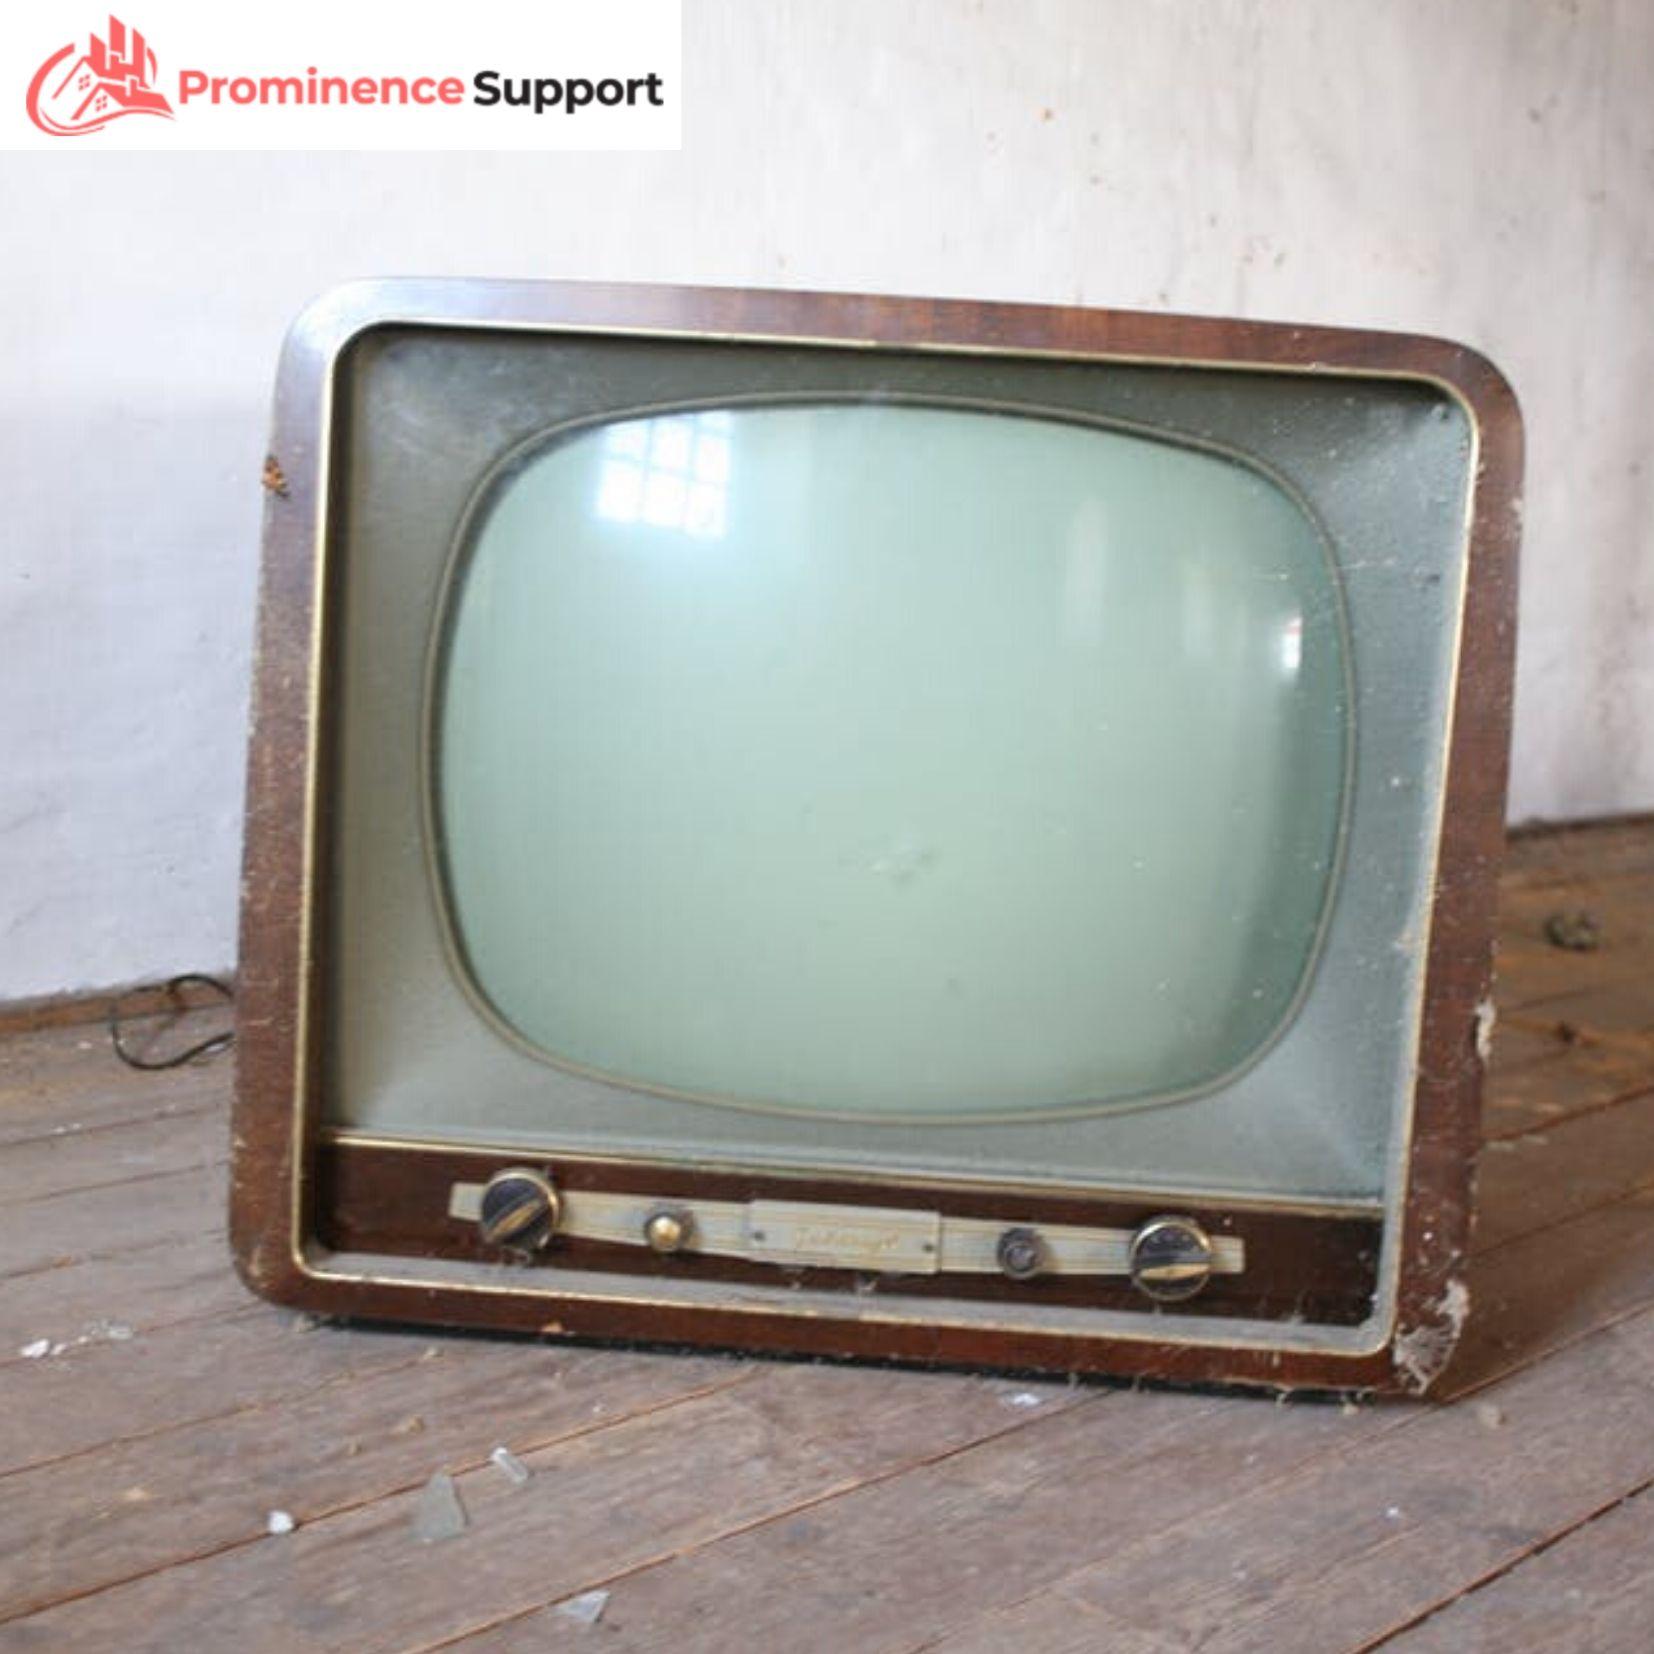 TV Insurance Accidental Damage